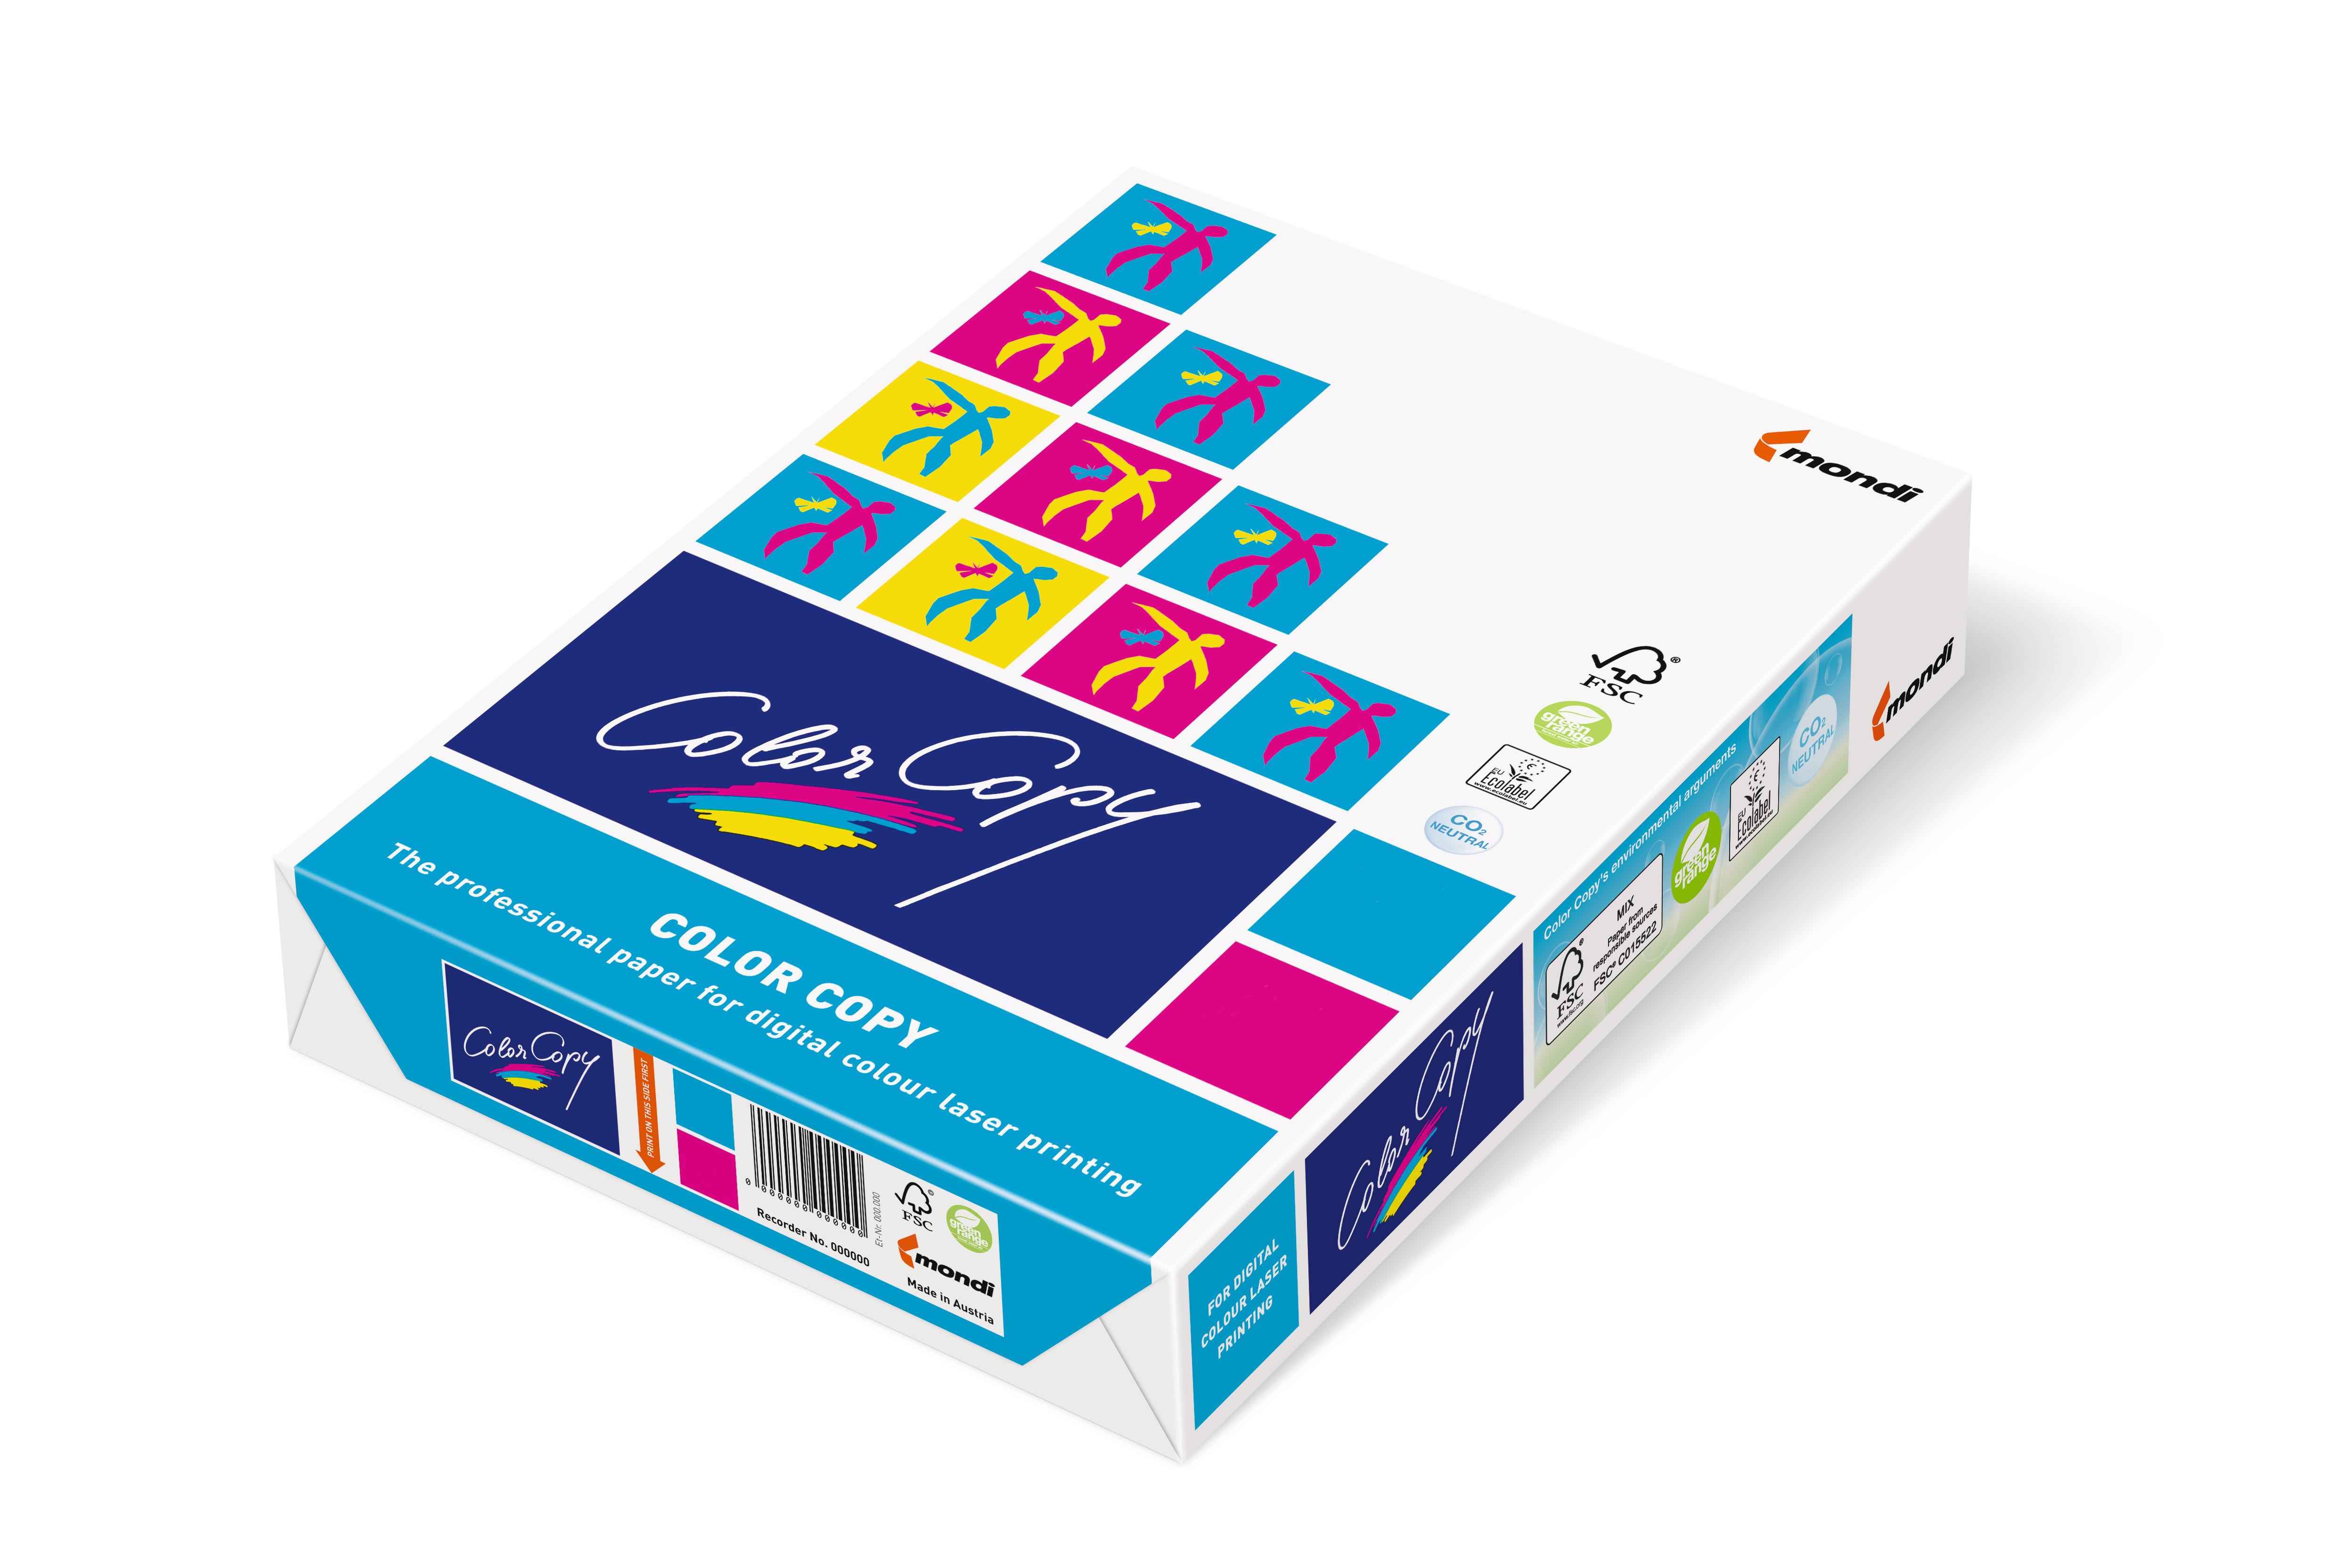 Mondi Color Copy 220 g/m² DIN-A5 500 Blatt